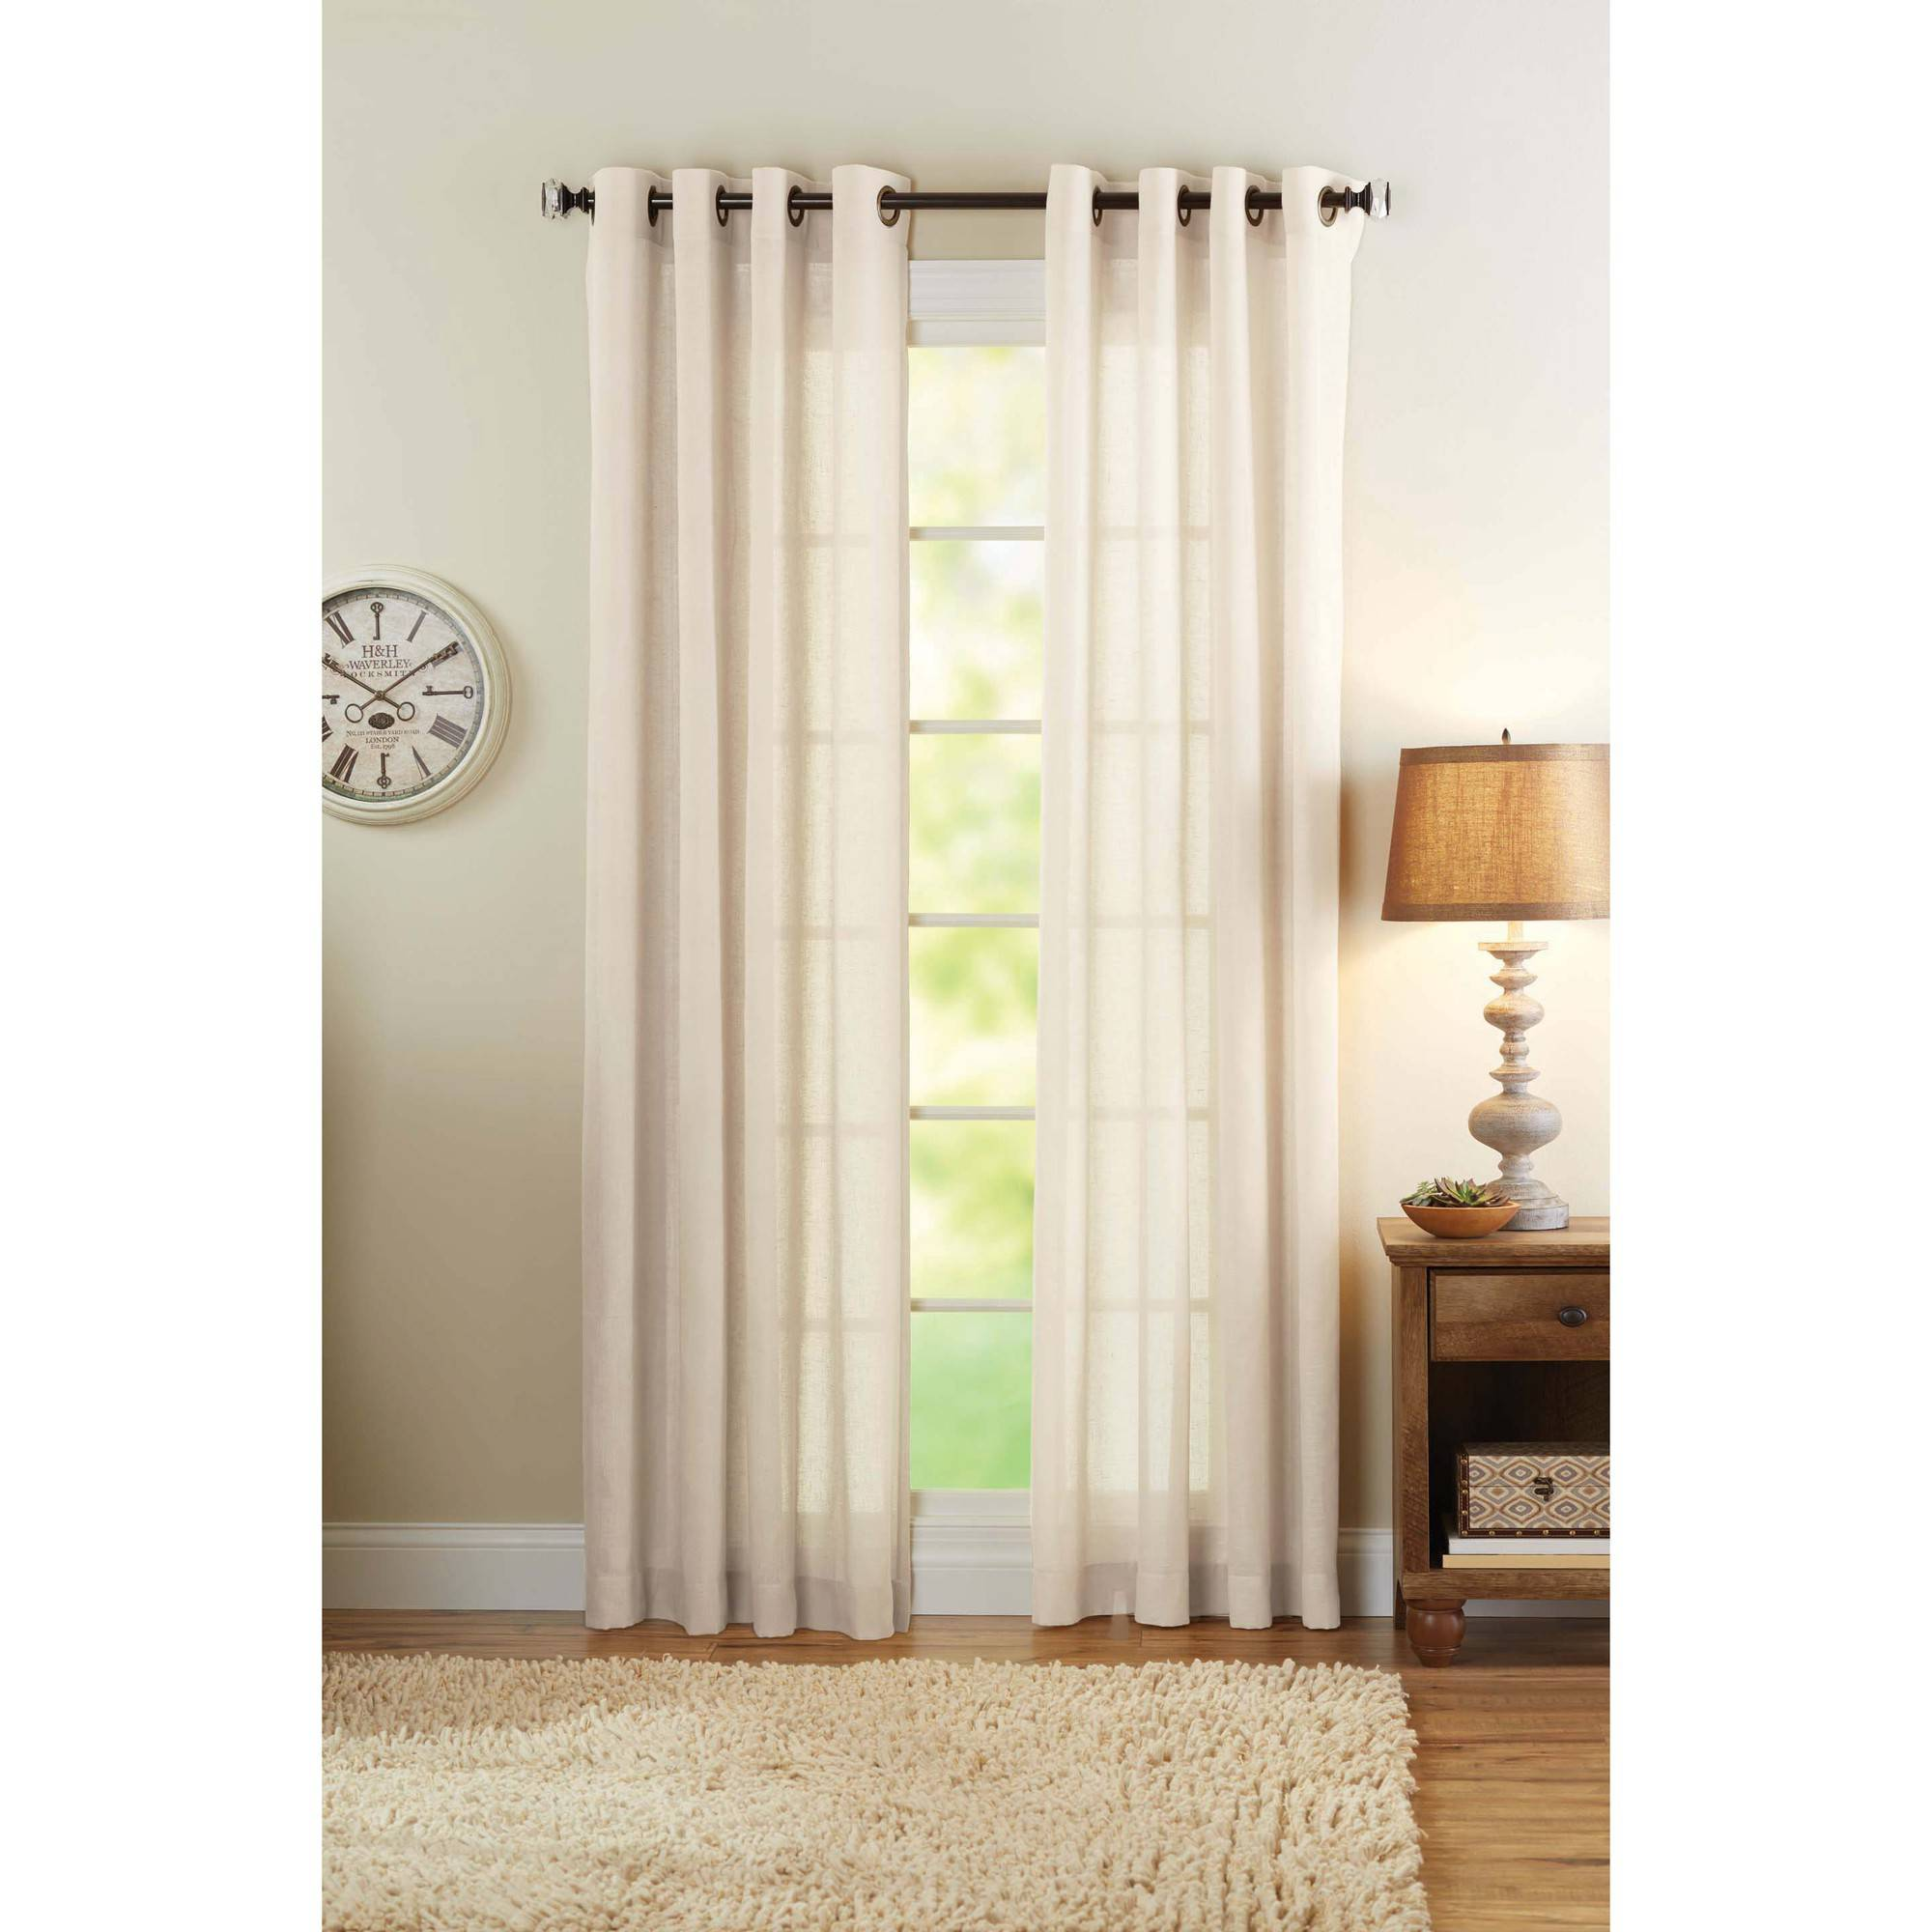 better homes and gardens semi-sheer grommet curtain panel